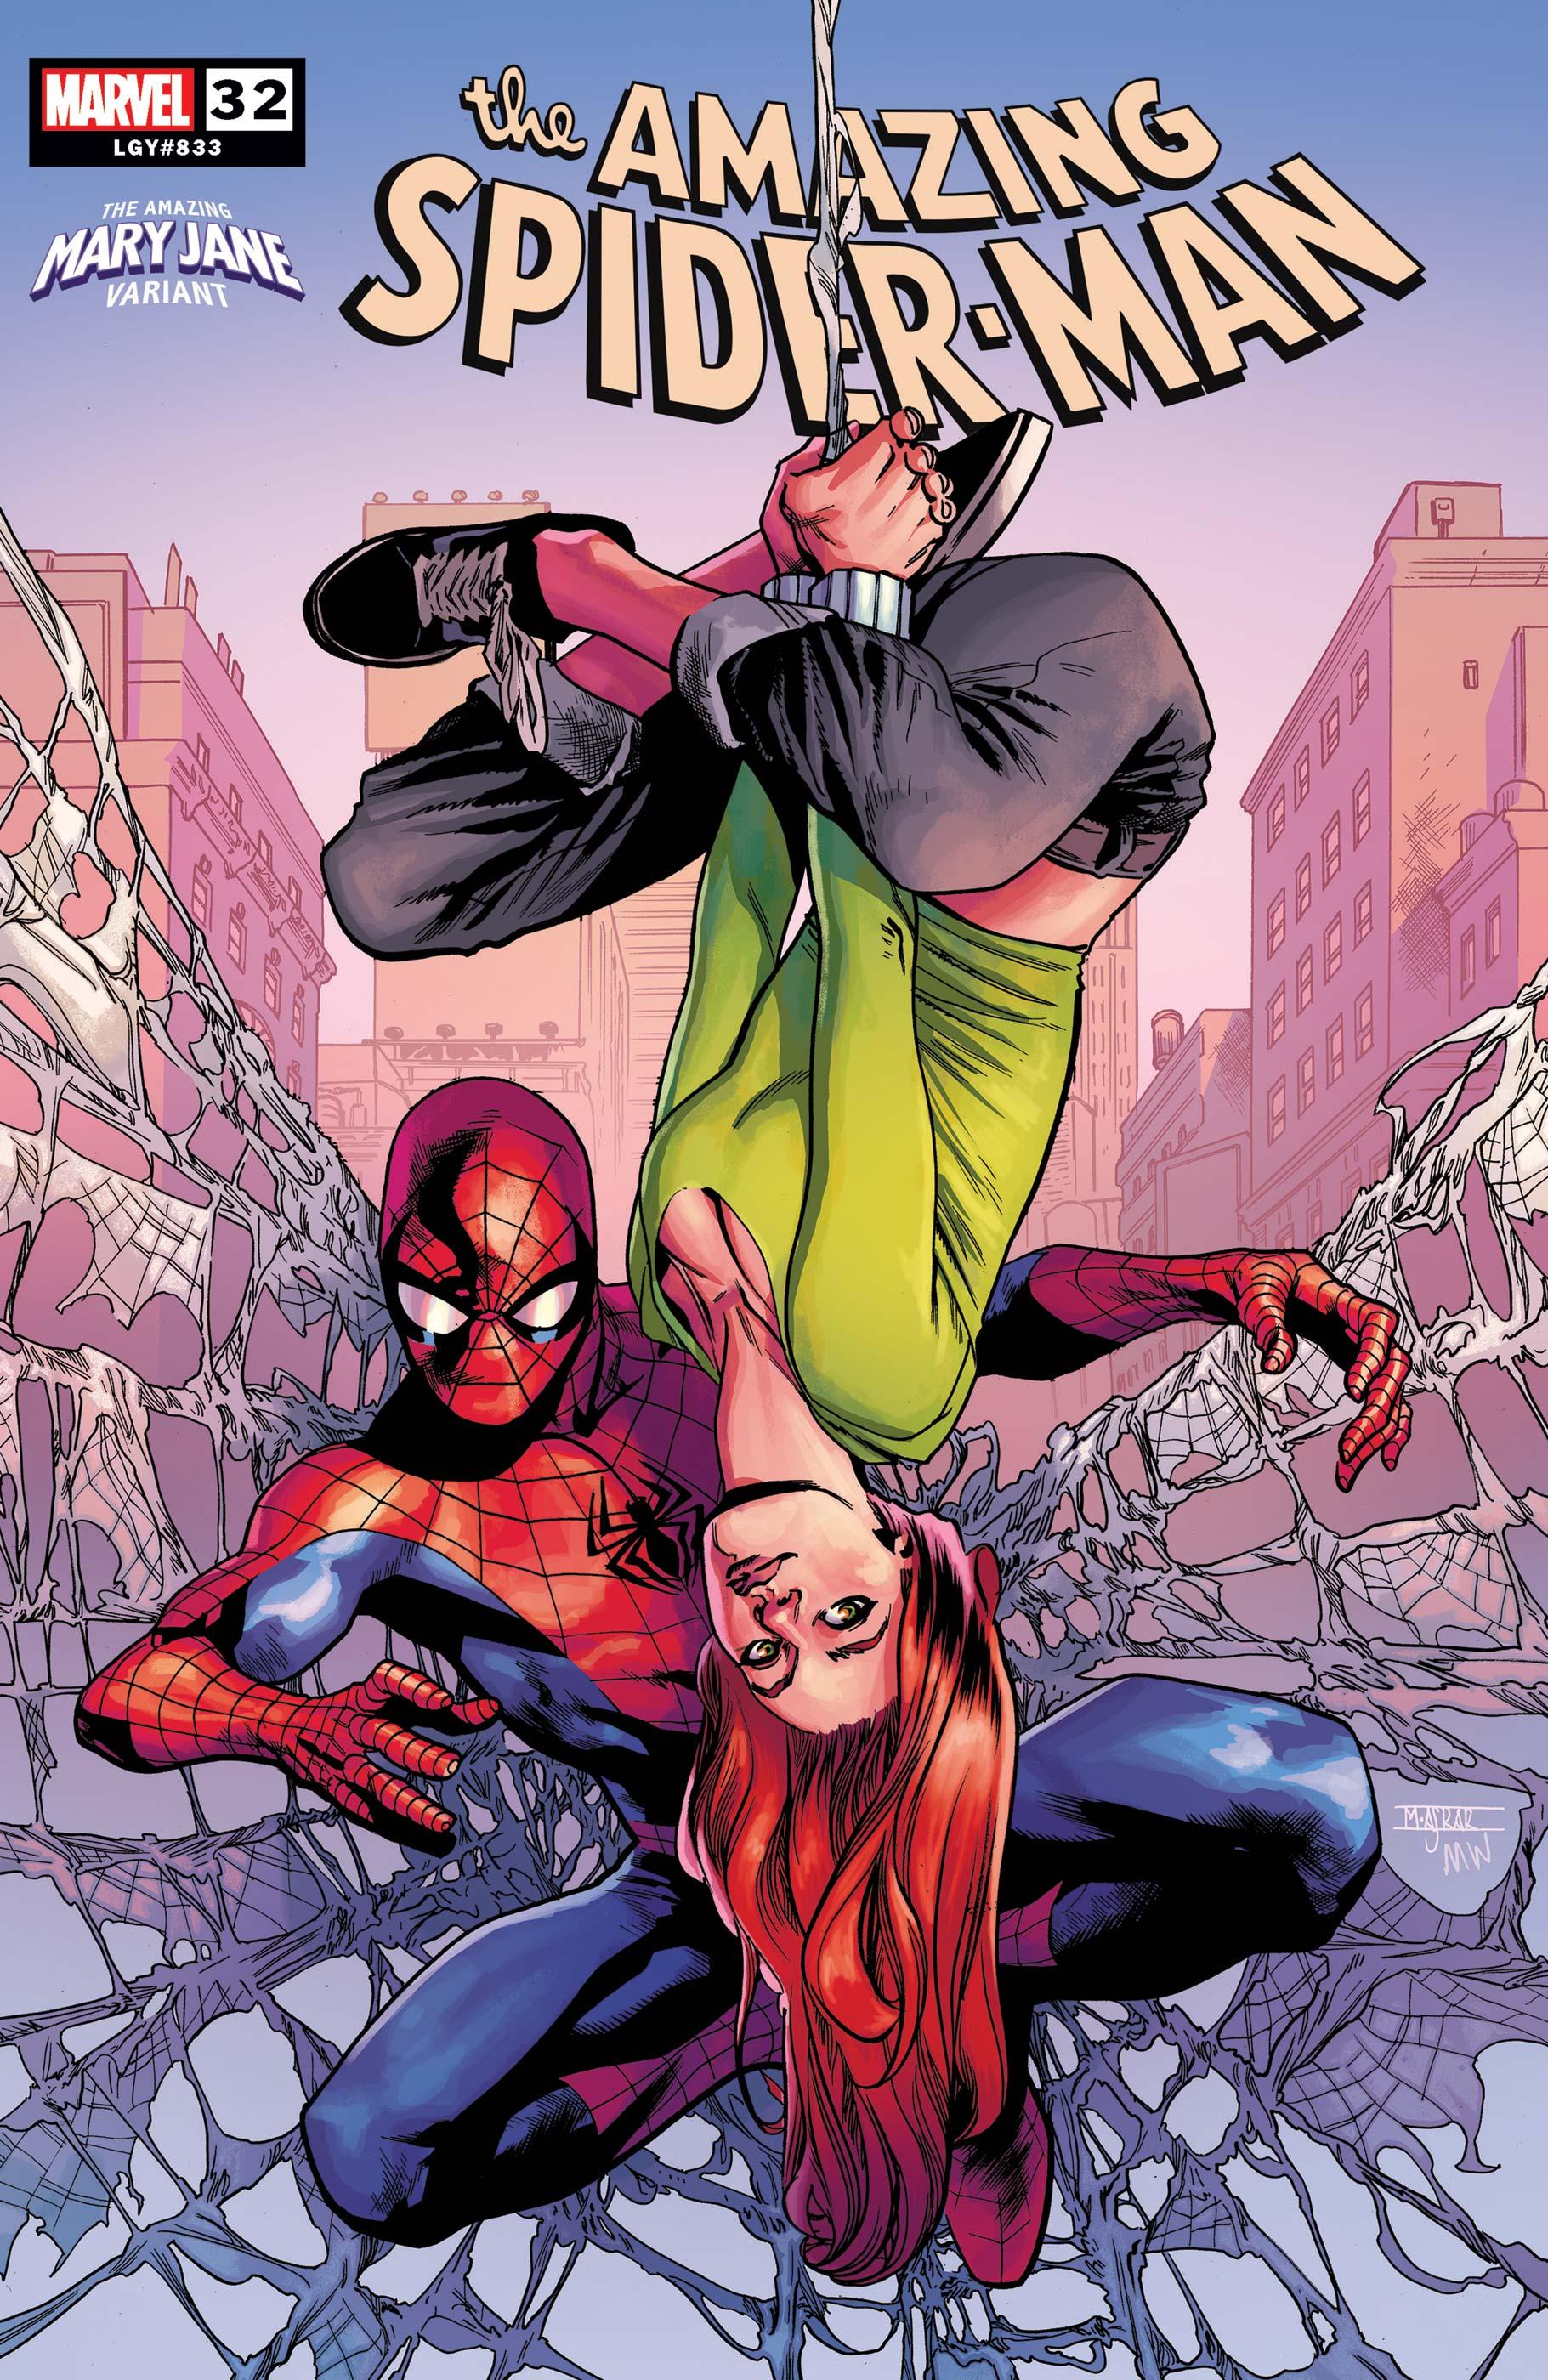 PATRICK GLEASON MAIN COVER MARVEL COMICS//2019 AMAZING SPIDER-MAN #33